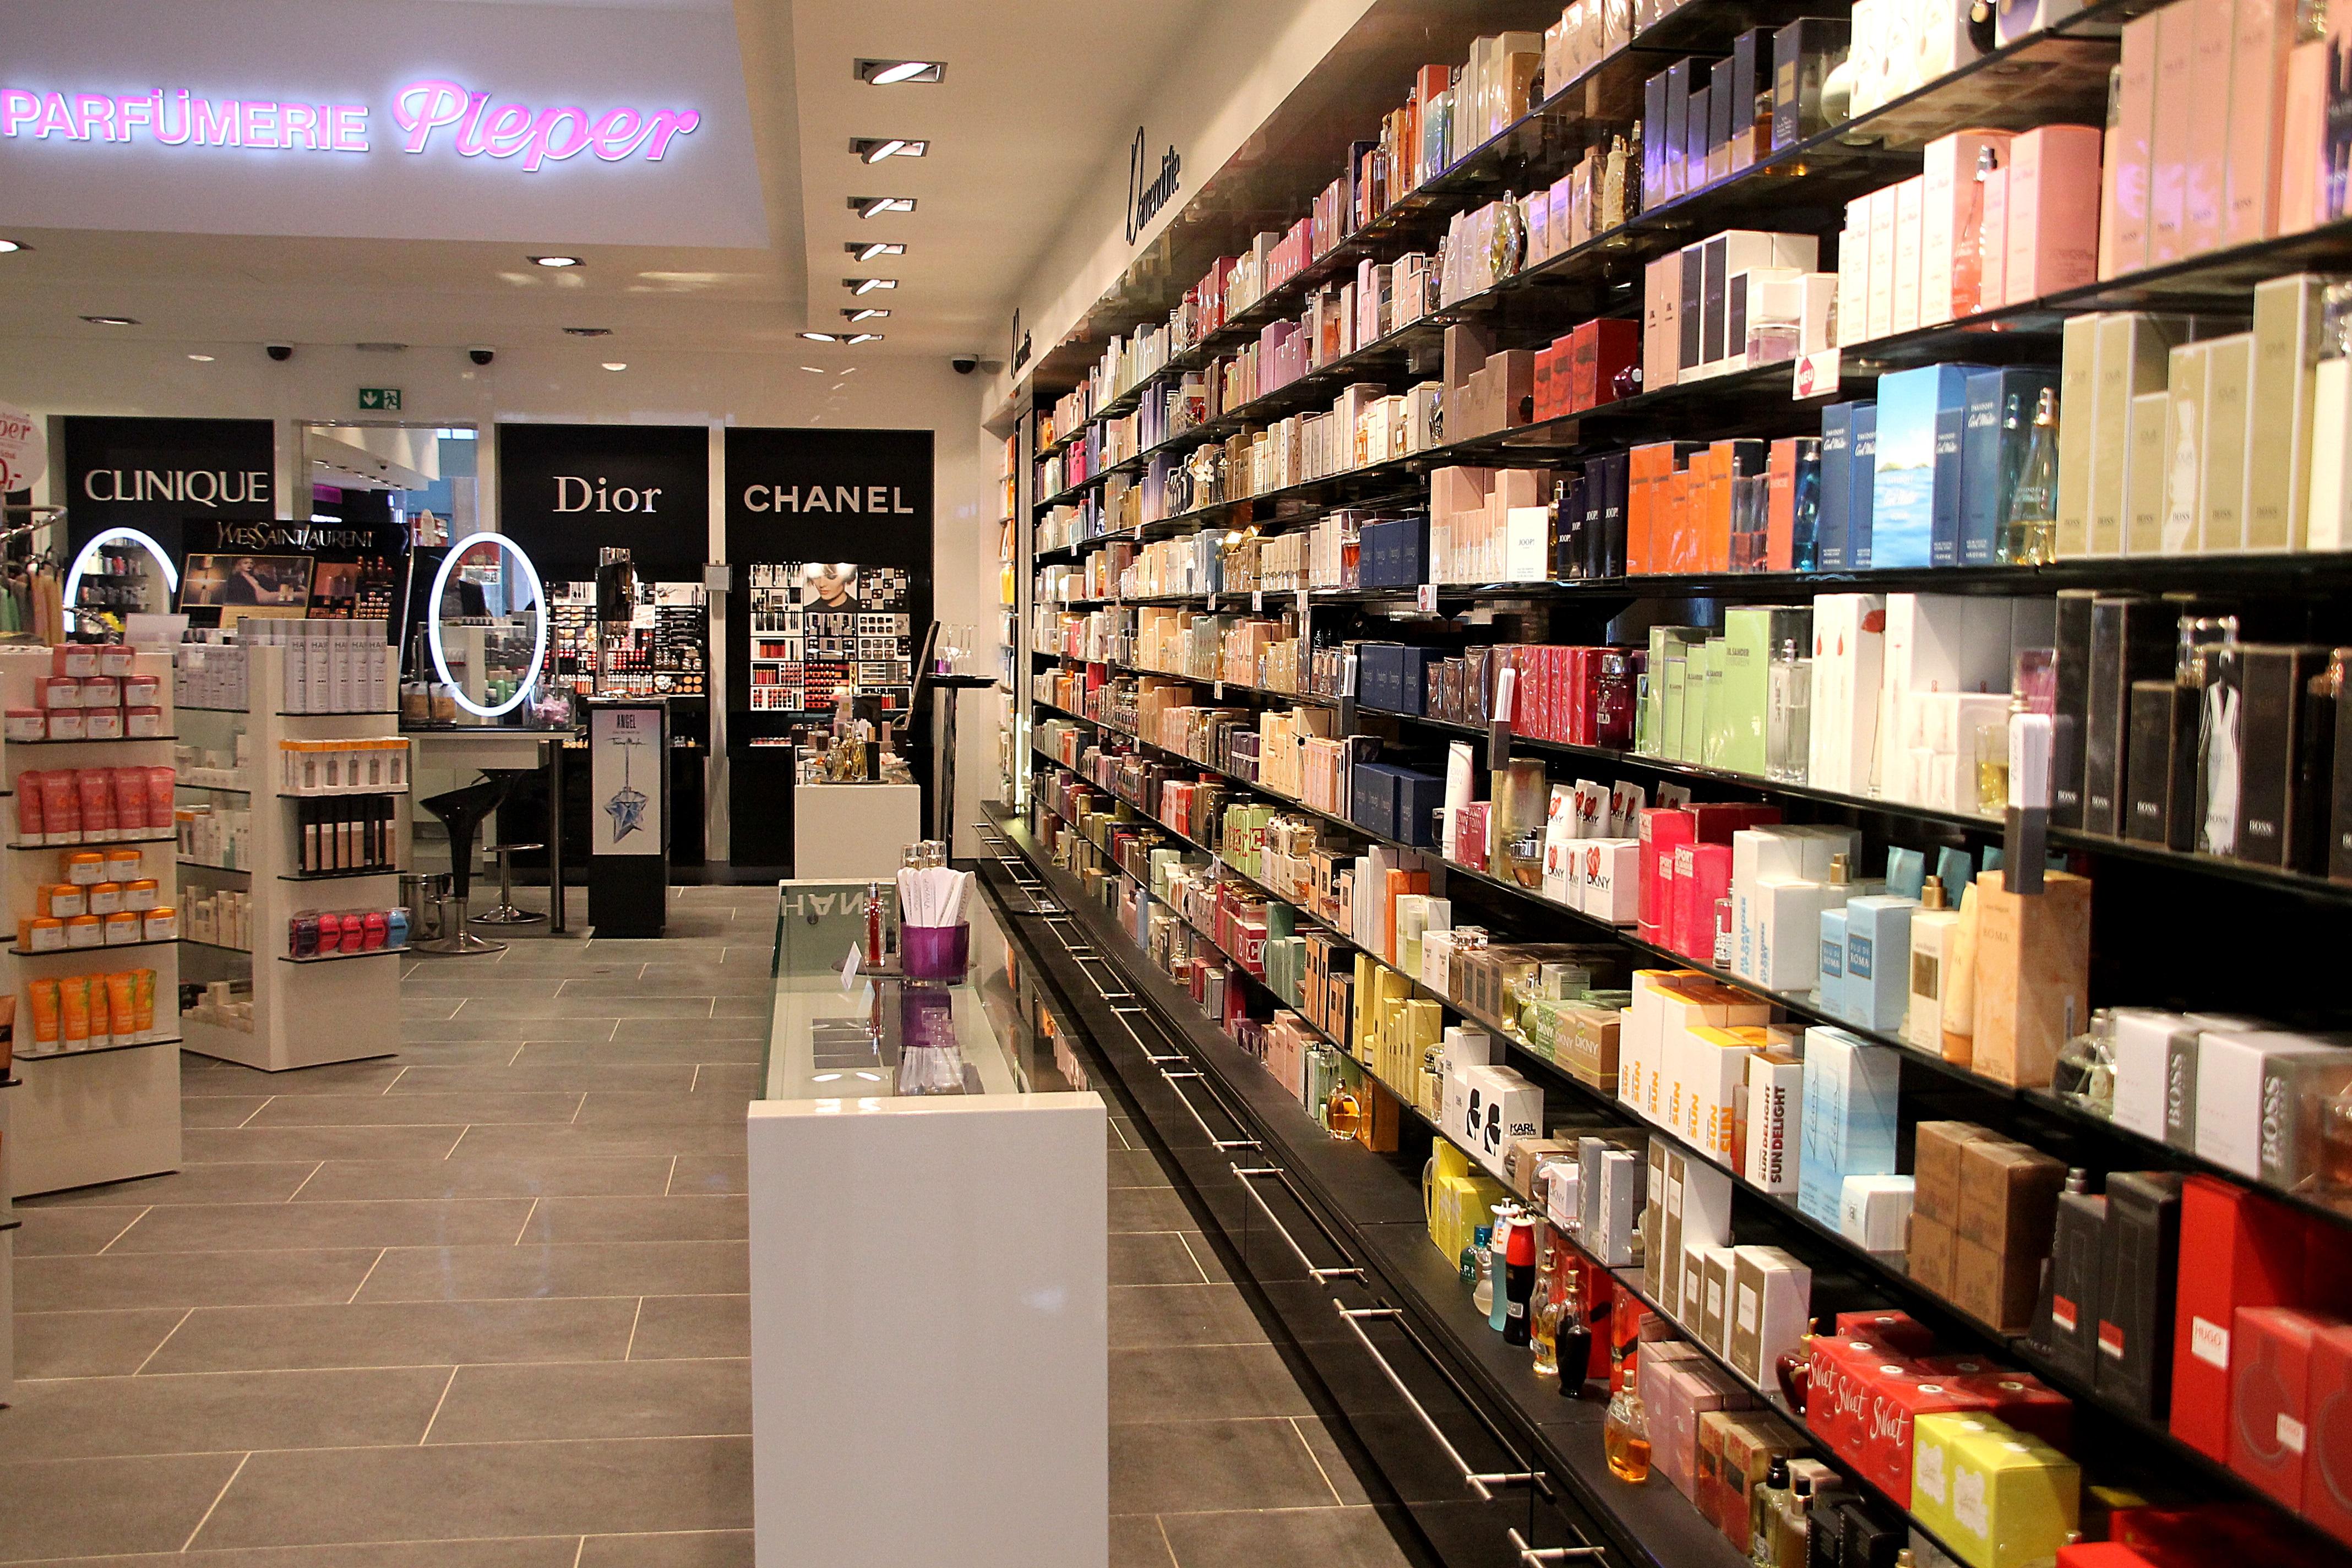 pieper parfümerie